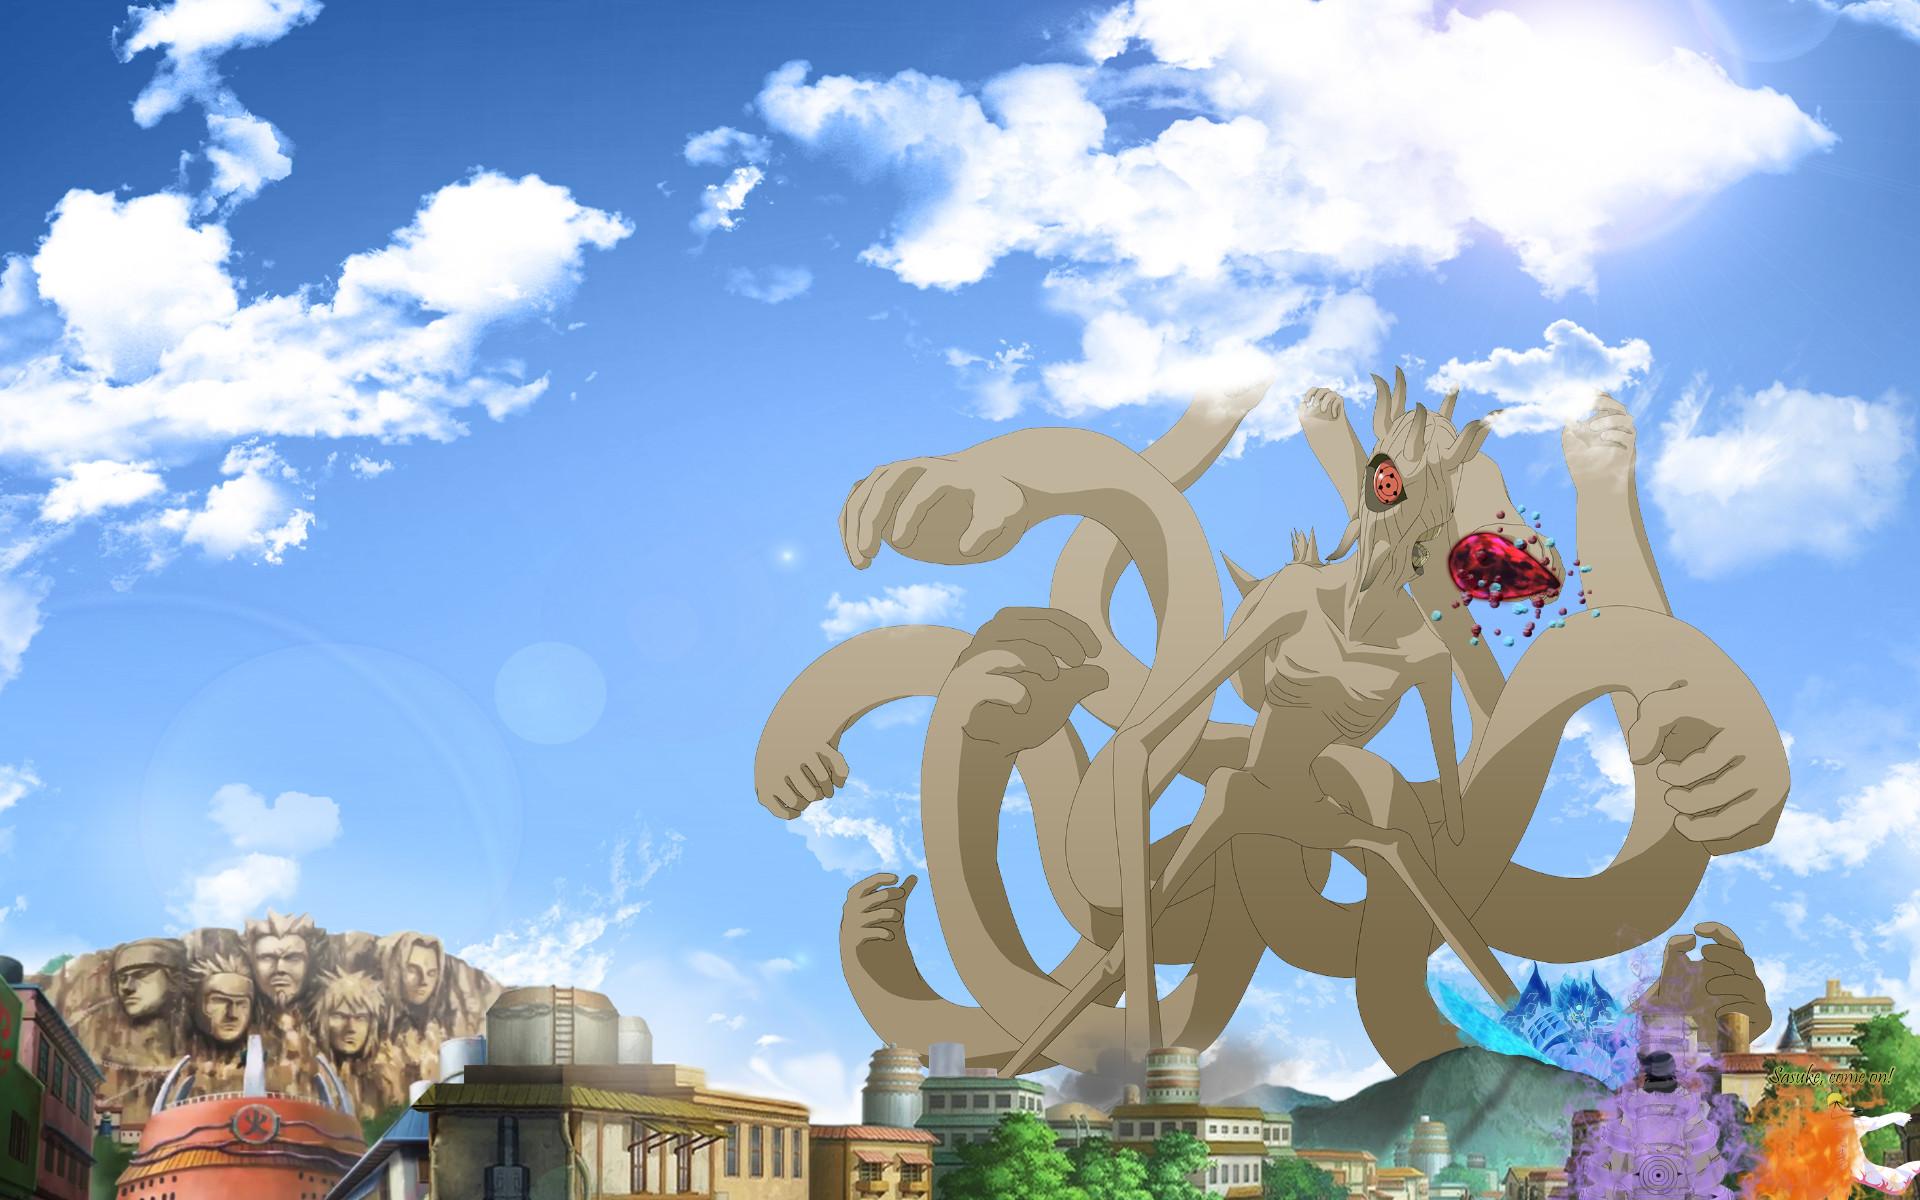 Download filem naruto sasuke vs madara uciha 2560x1600 naruto shippuden sasuke wallpaper image for tablet cartoons naruto wallpapers for tablet wallpapers voltagebd Images